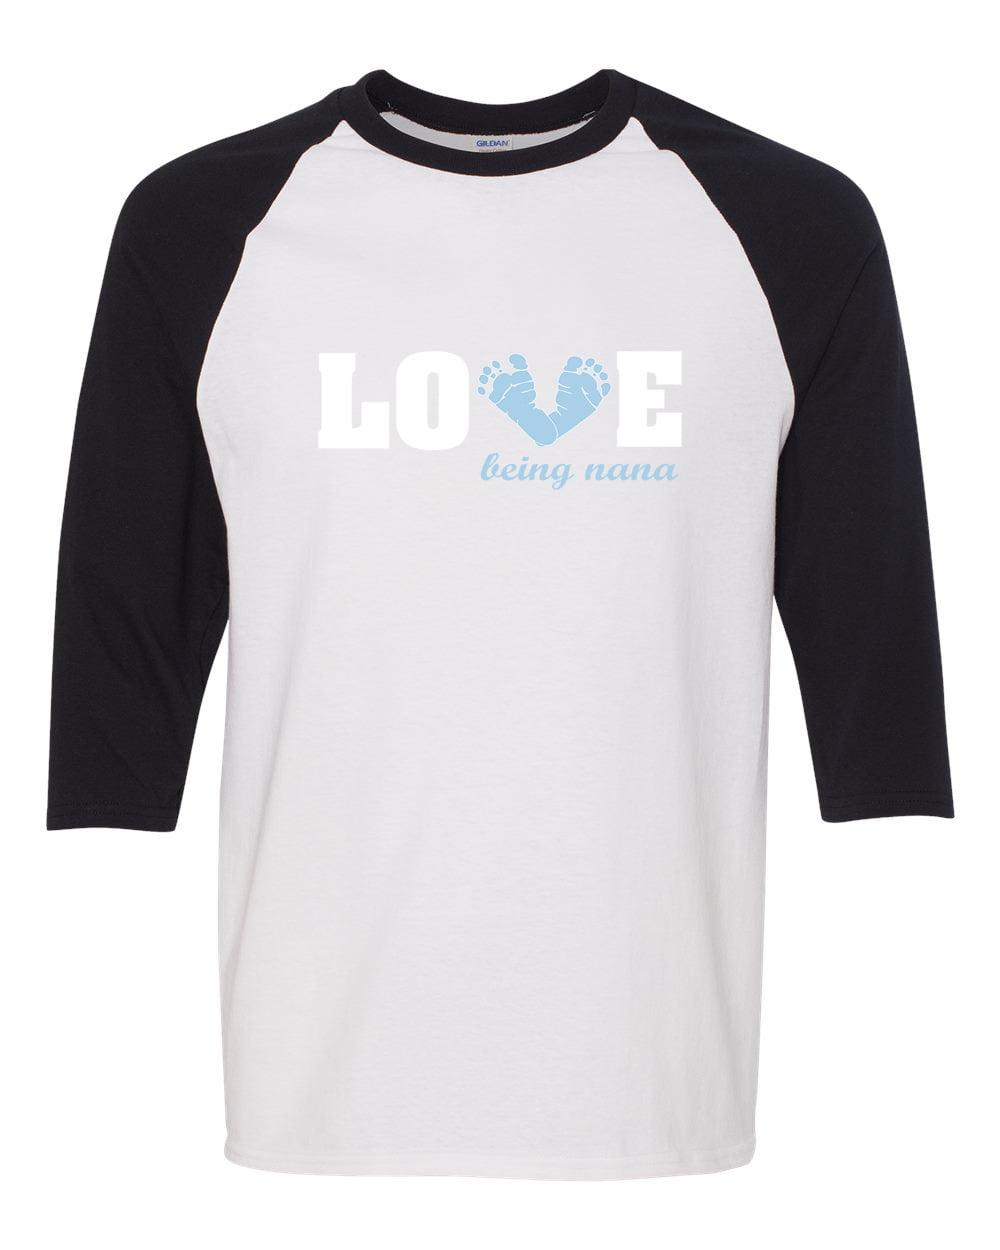 Love Being a Nana Baby Blue Feet 3/4 Raglan Sleeve T-Shirt